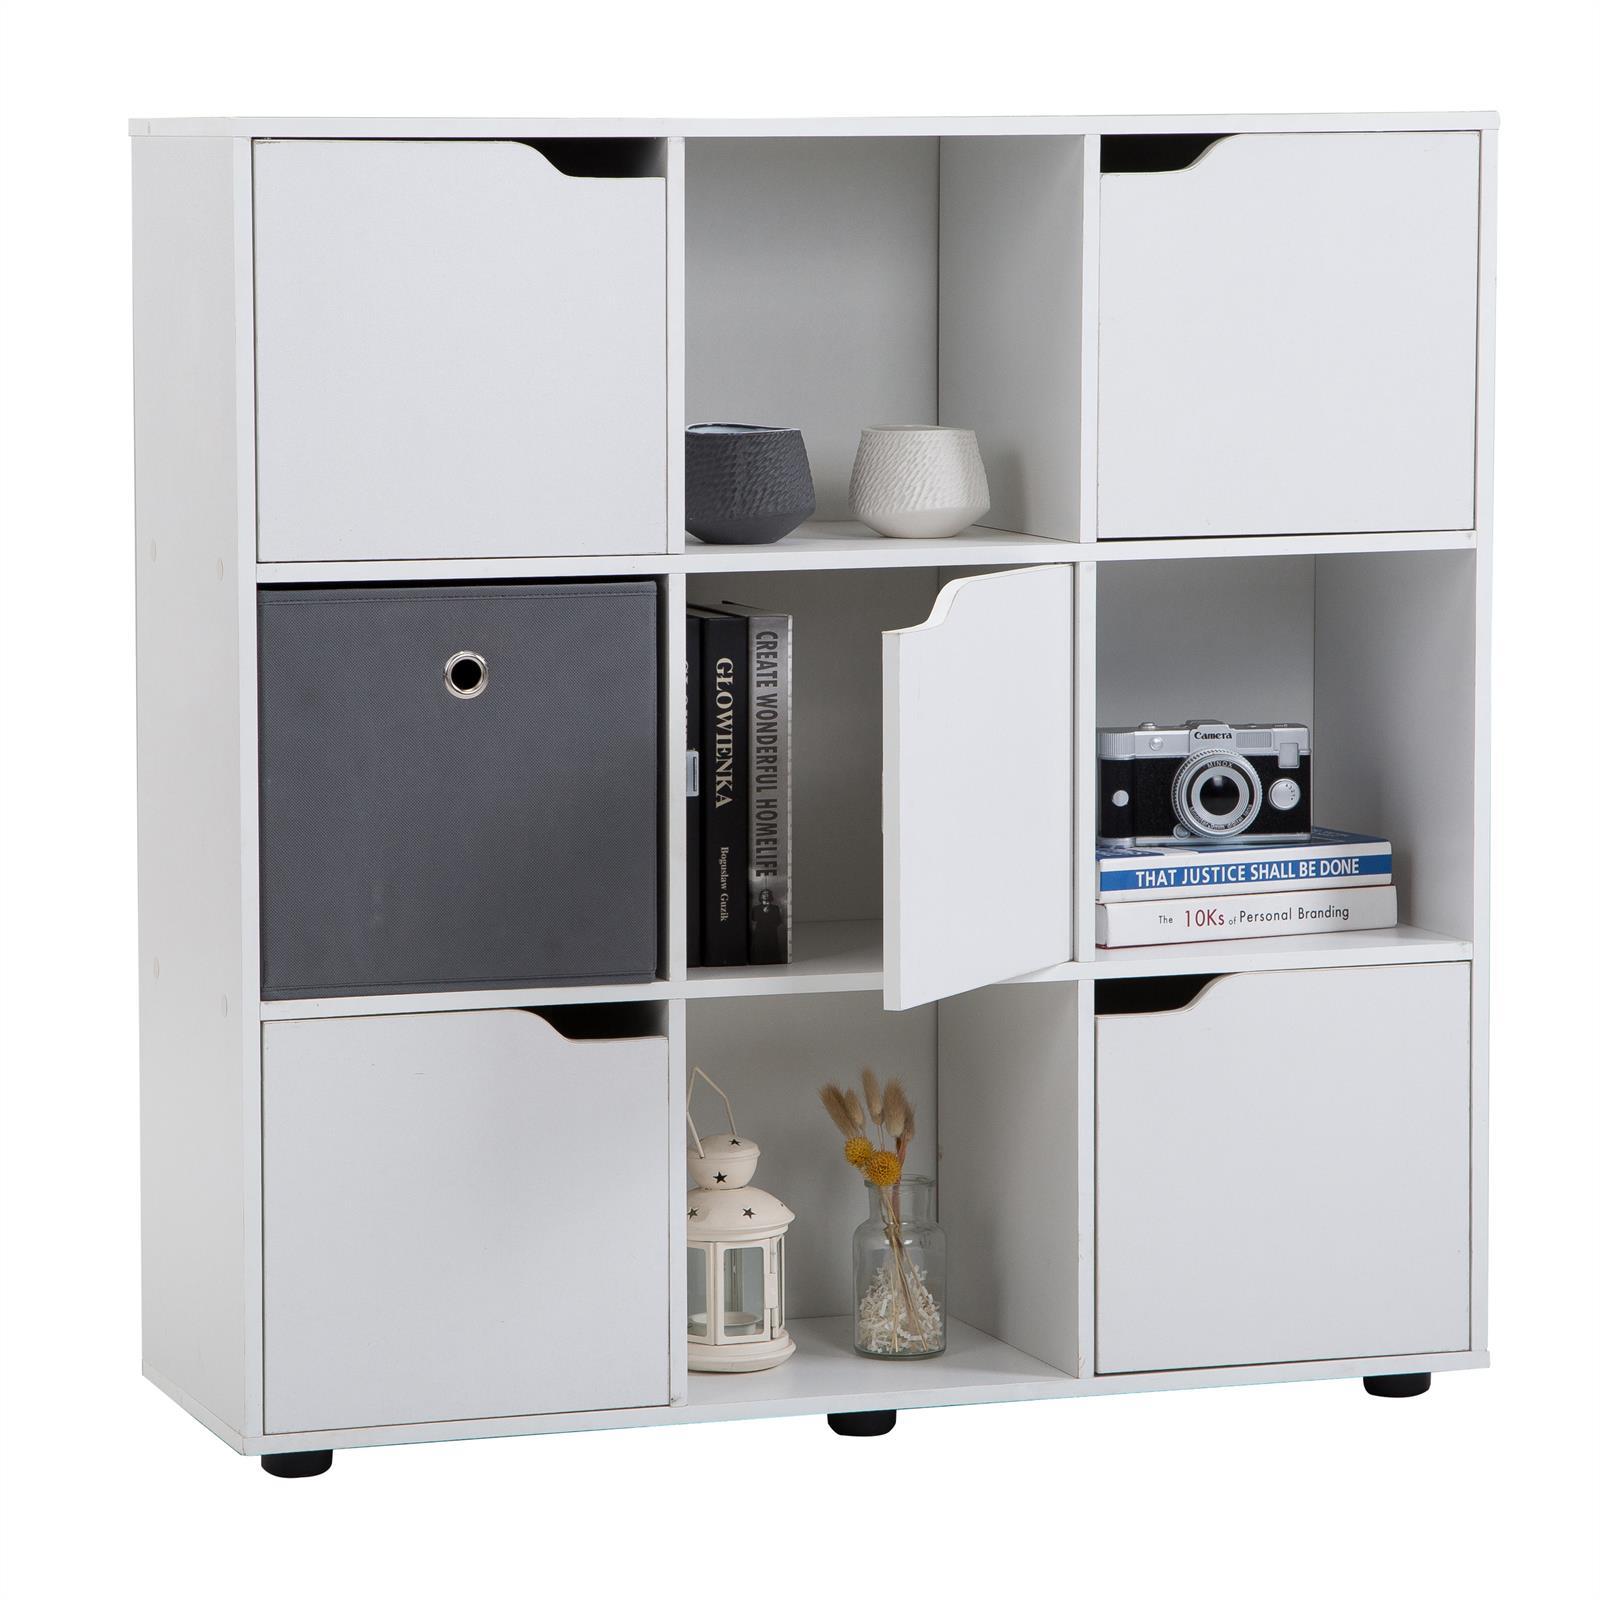 b cherregal raumteiler trenner schrank regalw rfel mit. Black Bedroom Furniture Sets. Home Design Ideas